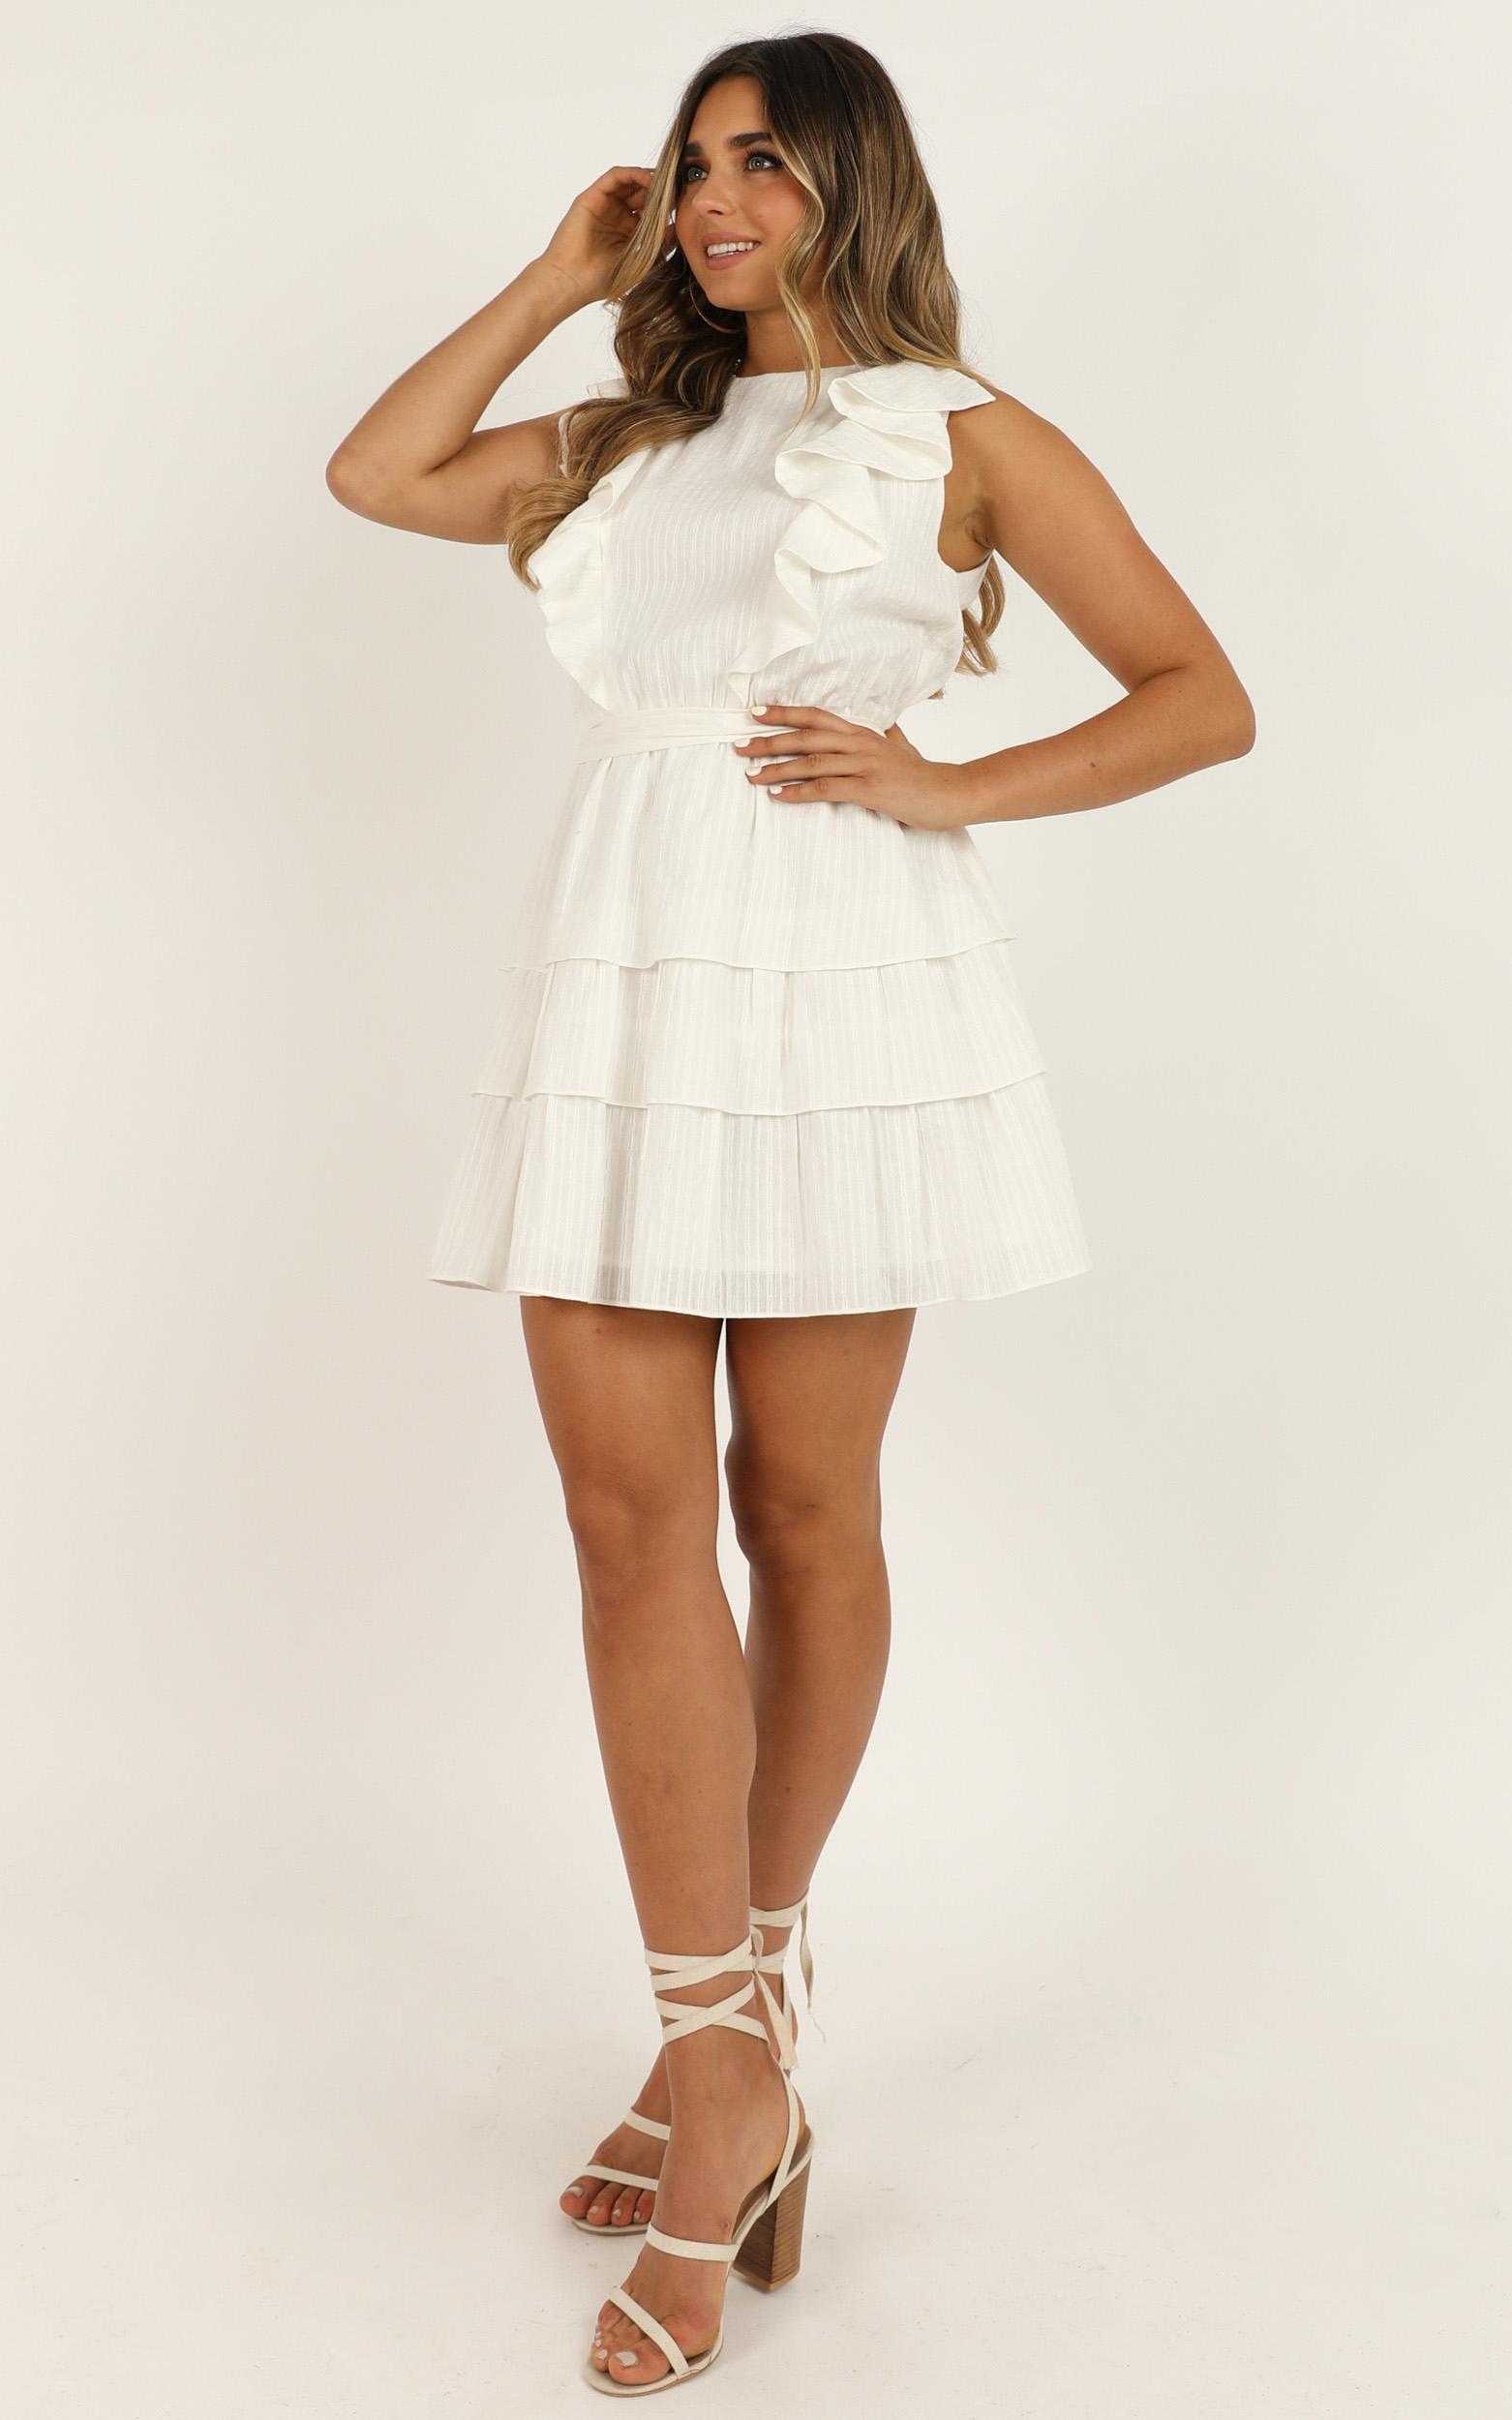 Sunset Beach Walk dress in white - 16 (XXL), White, hi-res image number null